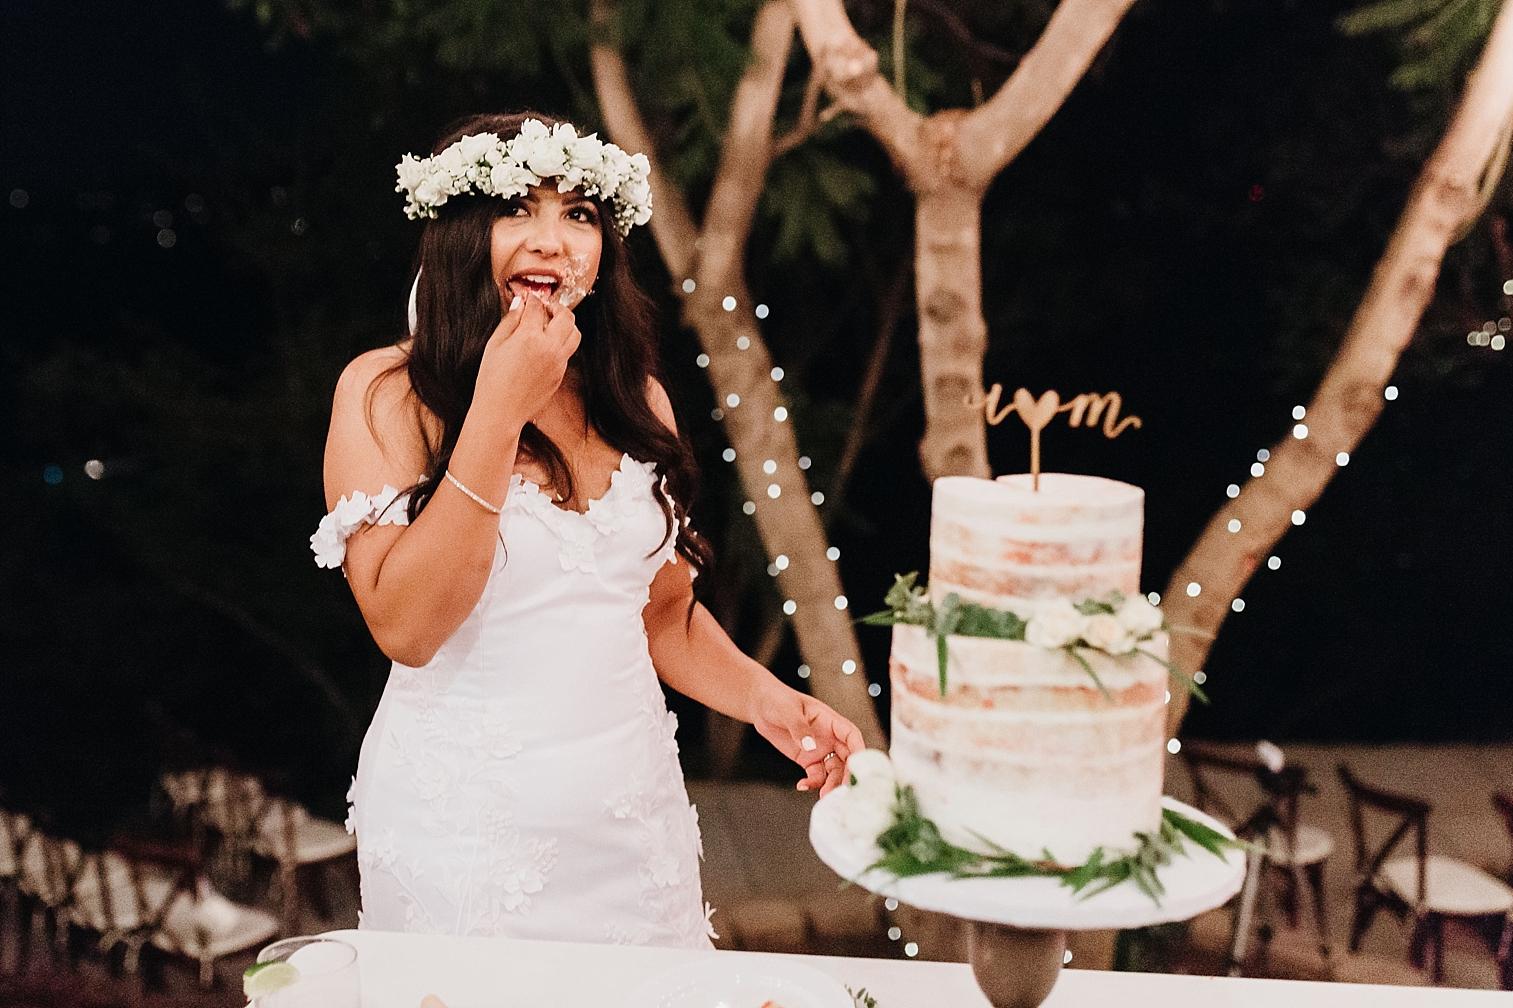 Escondido-Backyard-Wedding-59.jpg